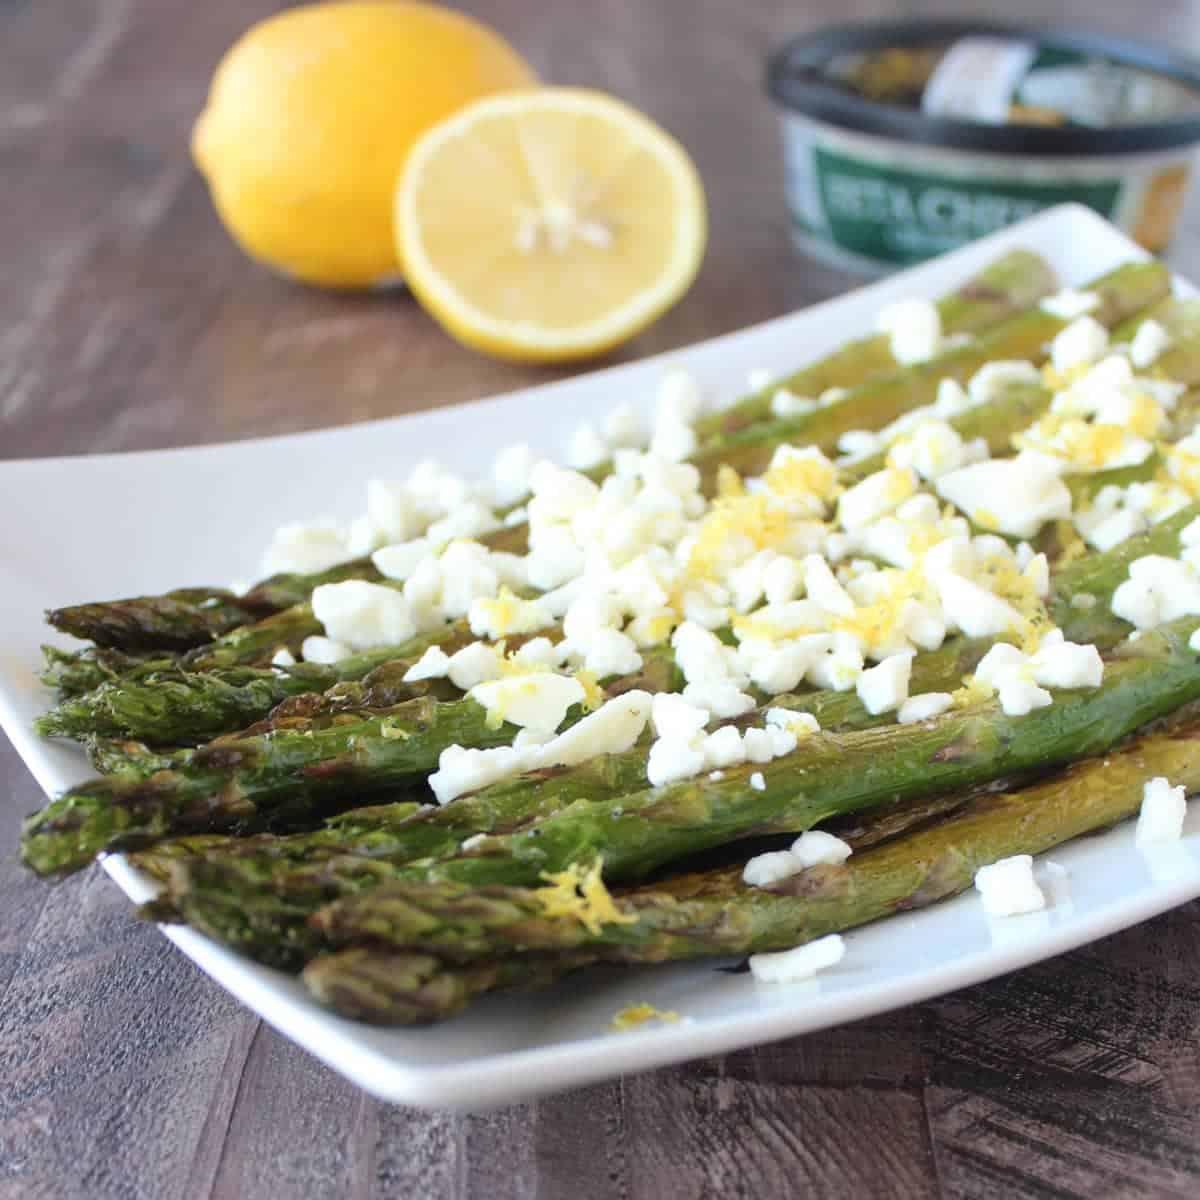 Garlic Lemon Grilled Asparagus with Feta Cheese